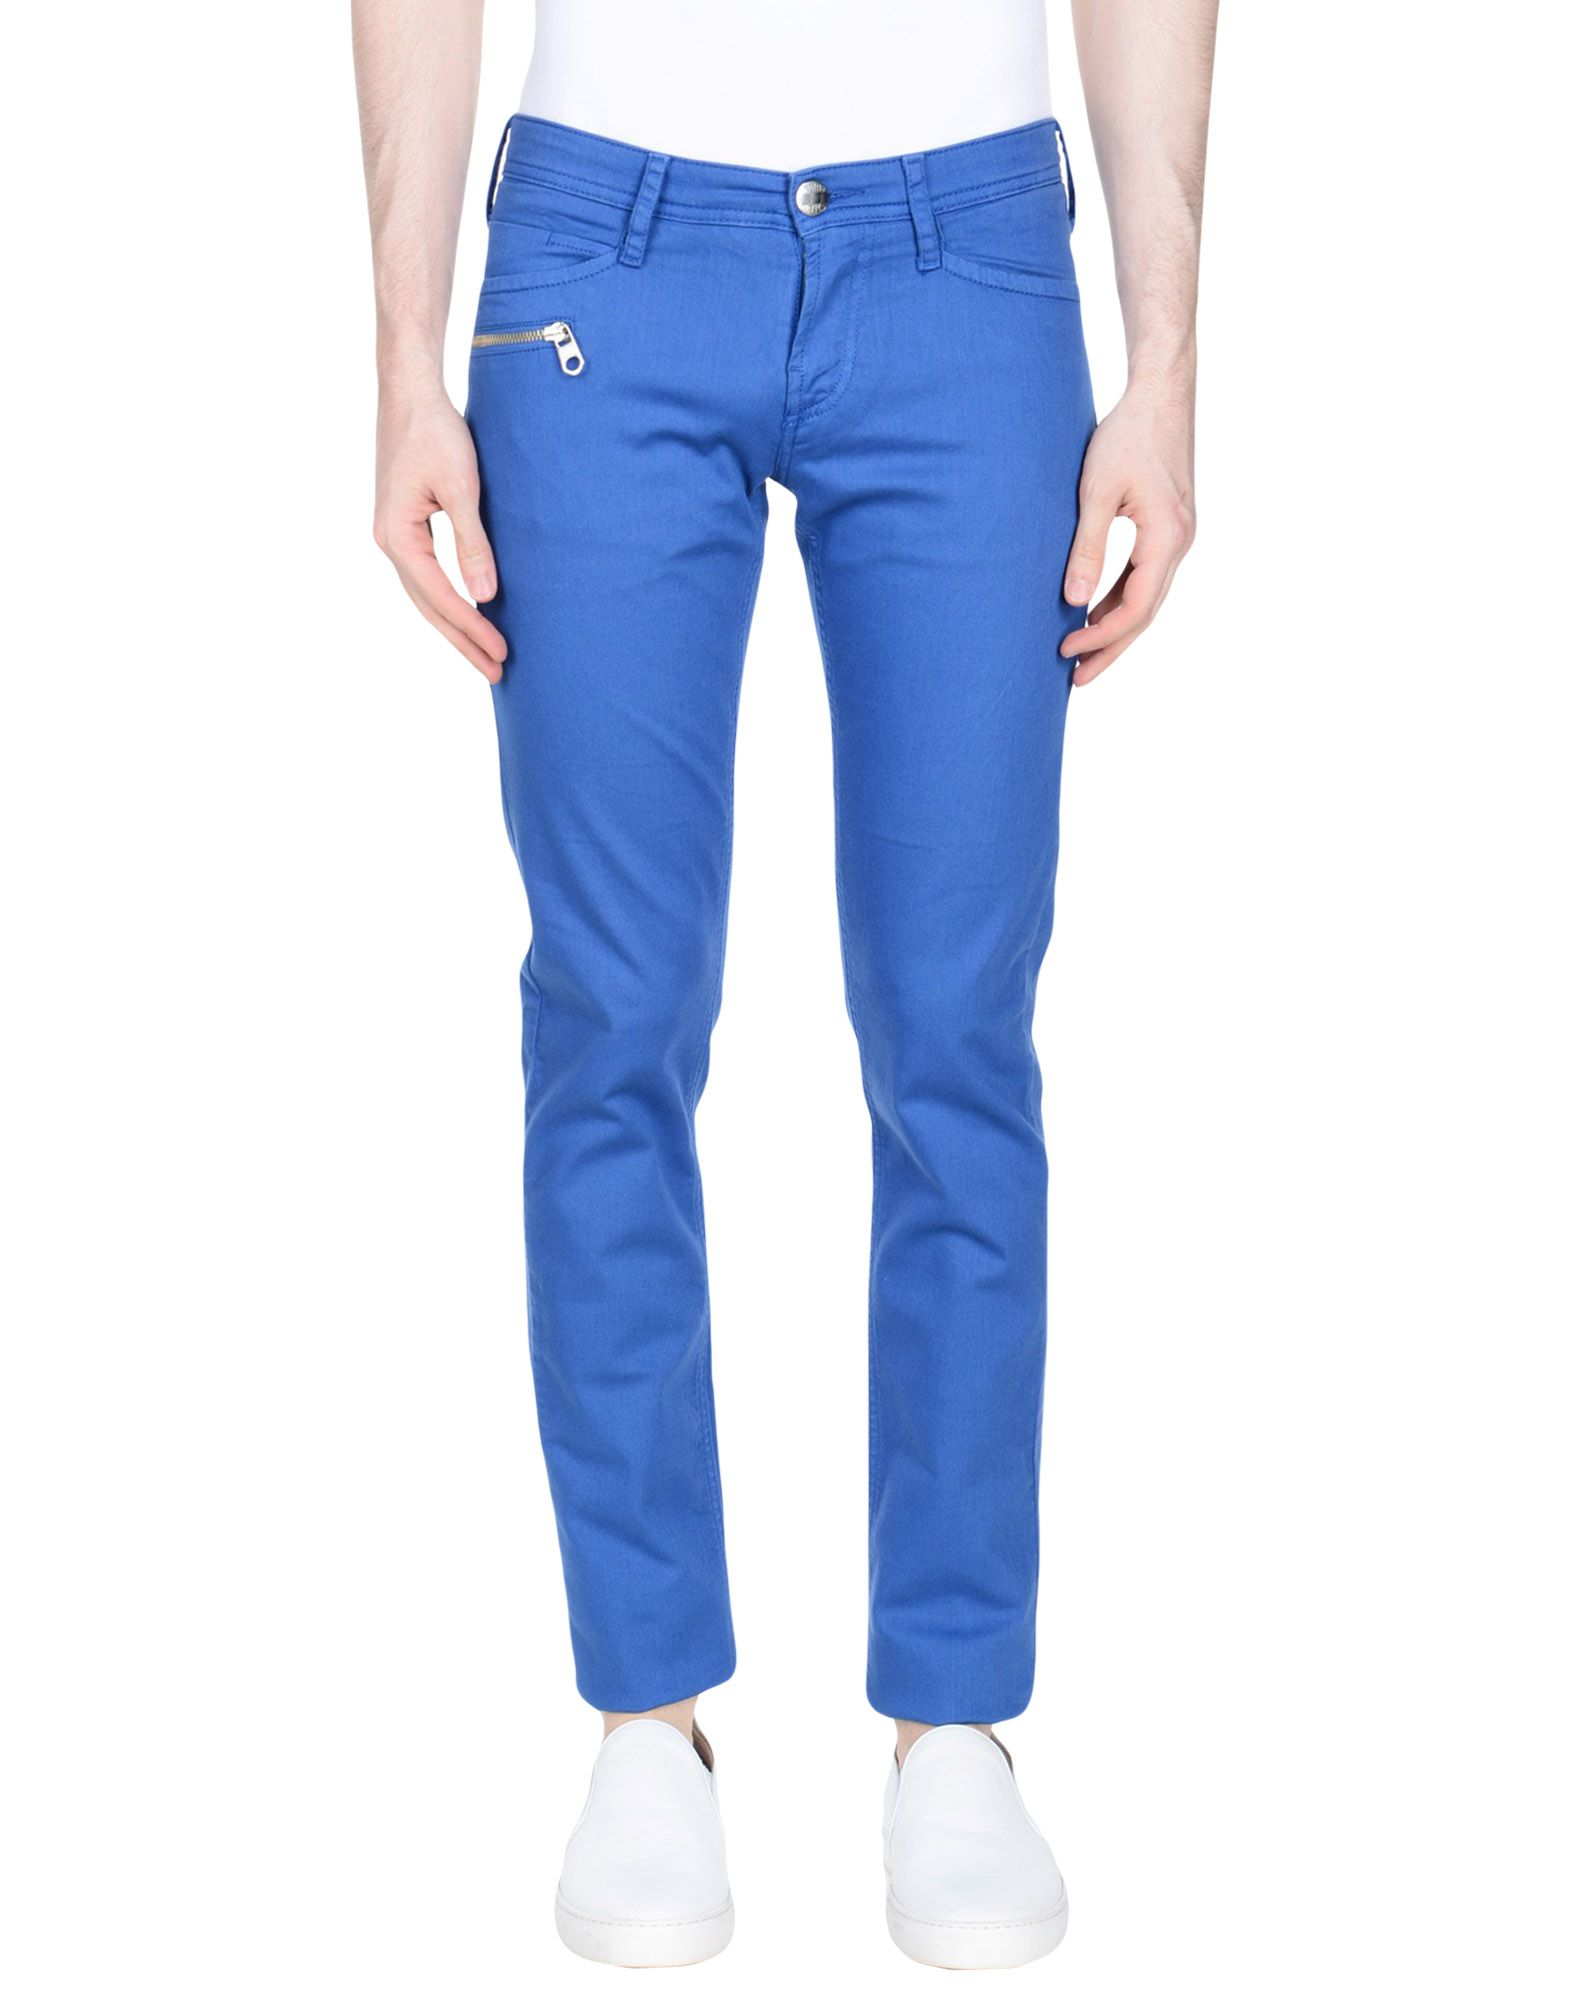 Pantaloni Jeans Versace Jeans Donna - Acquista online su